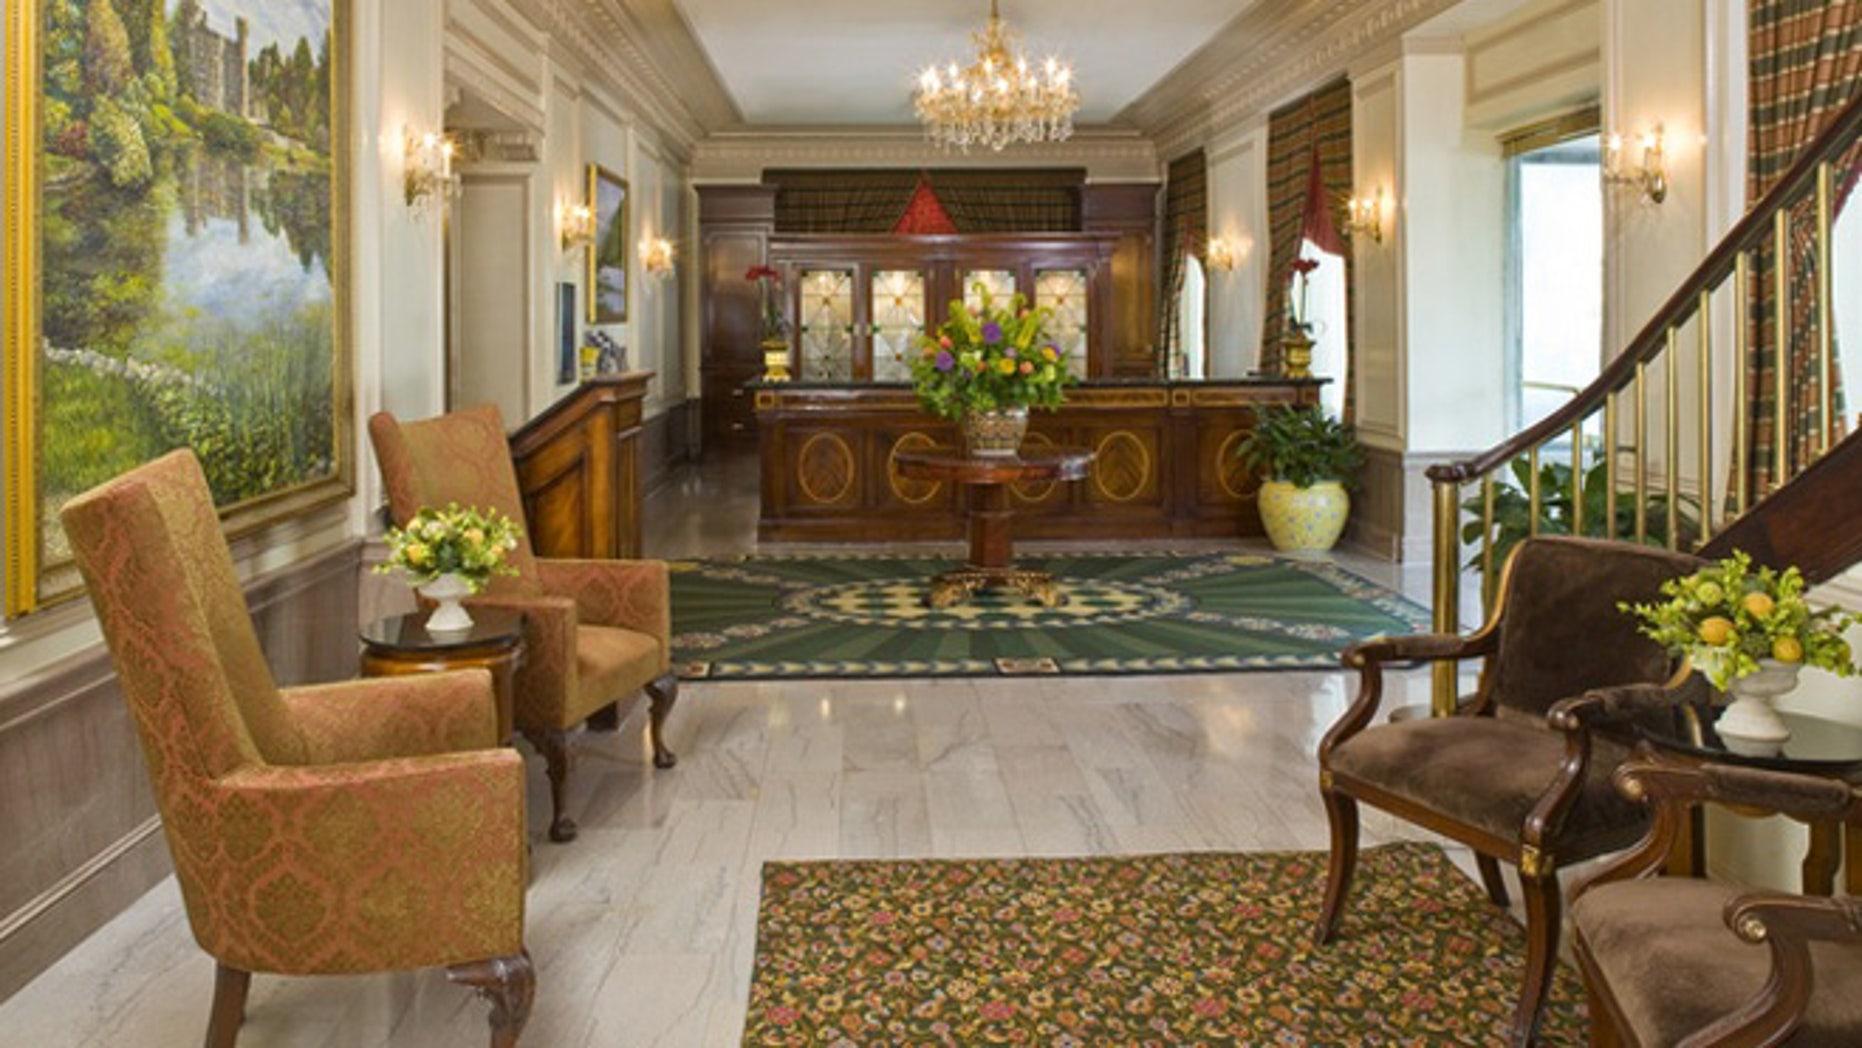 The lobby at the Phoenix Park Hotel.